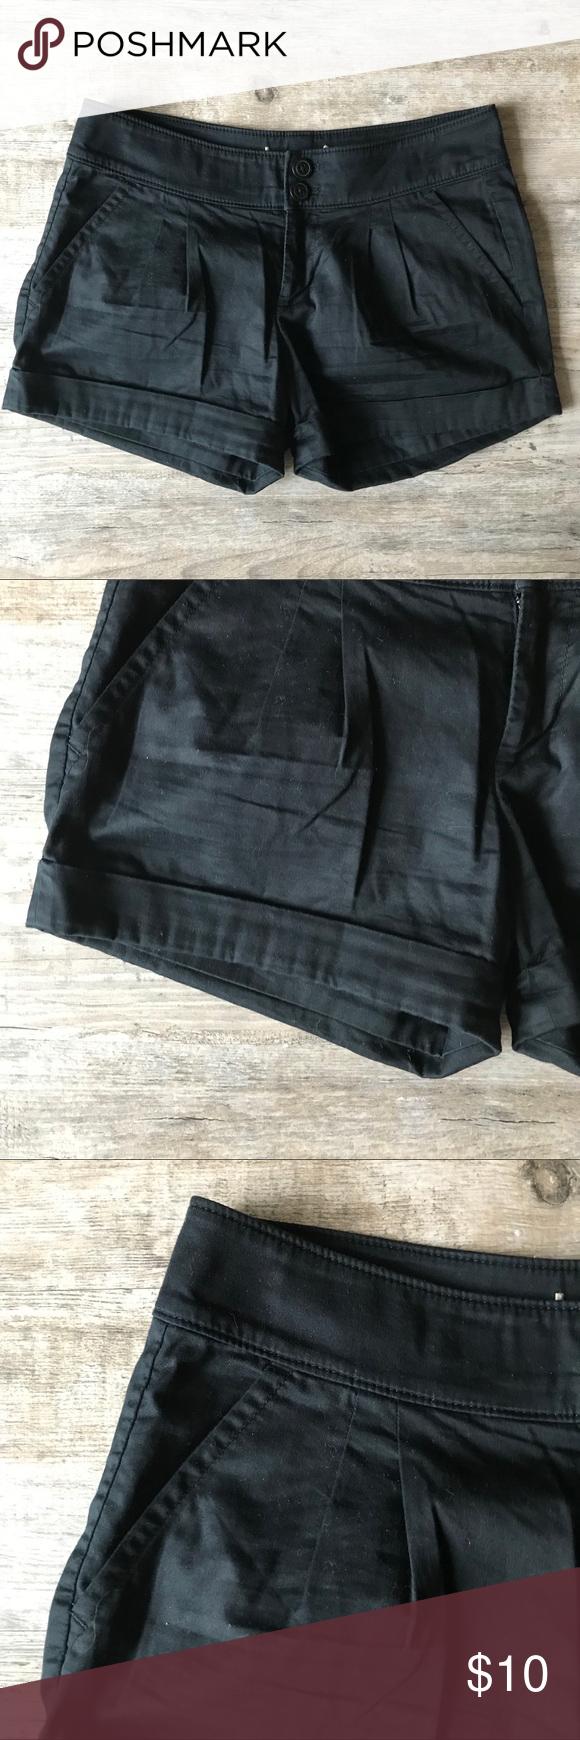 Pin em Poshmark shorts